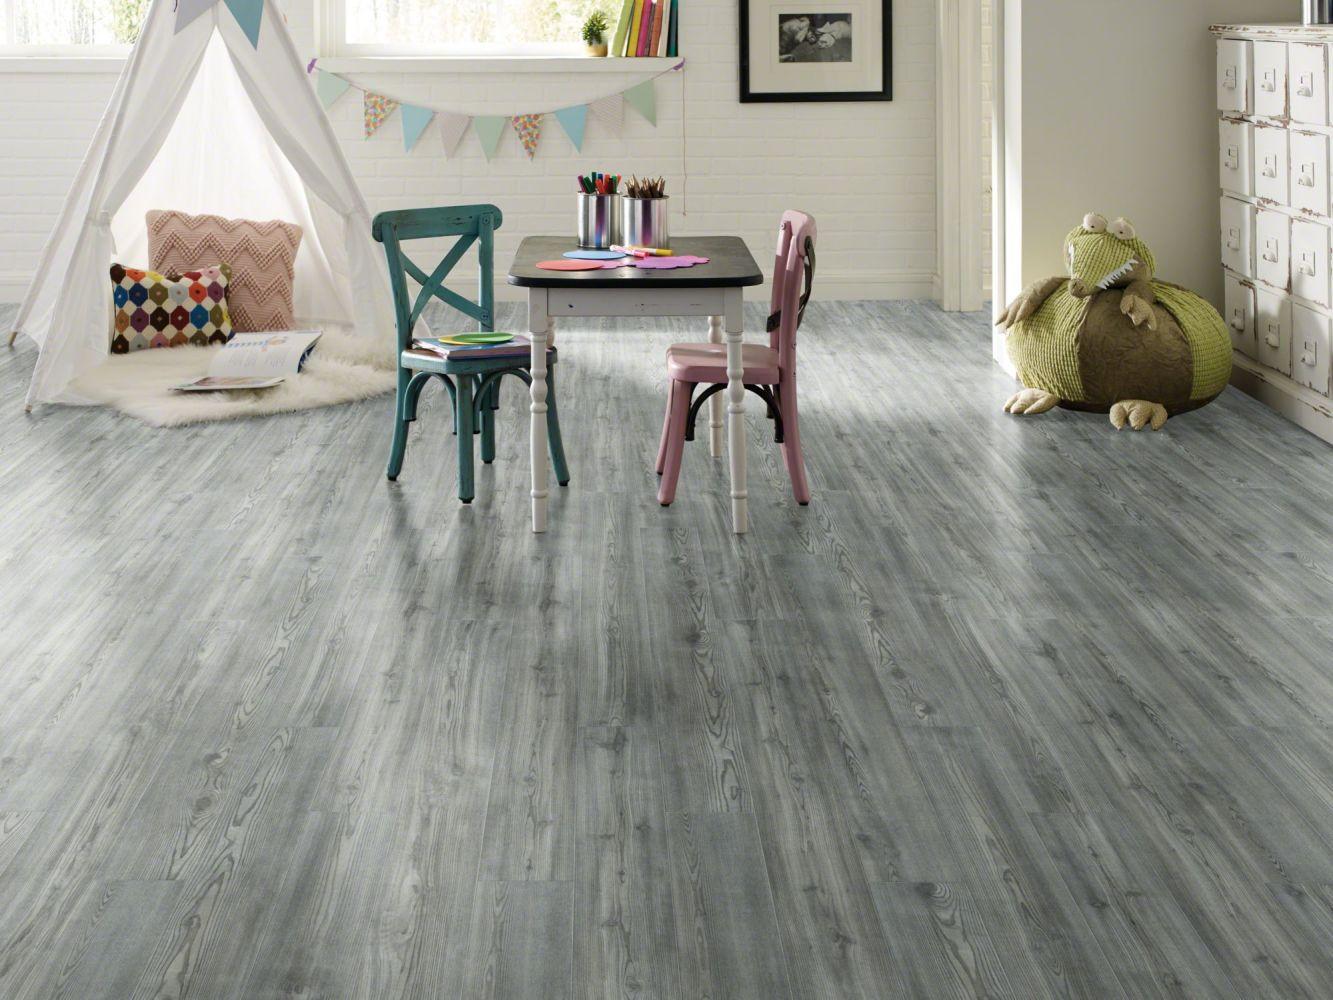 Shaw Floors Vinyl Residential Paragon 7″ Plus Fresh Pine 05052_1020V